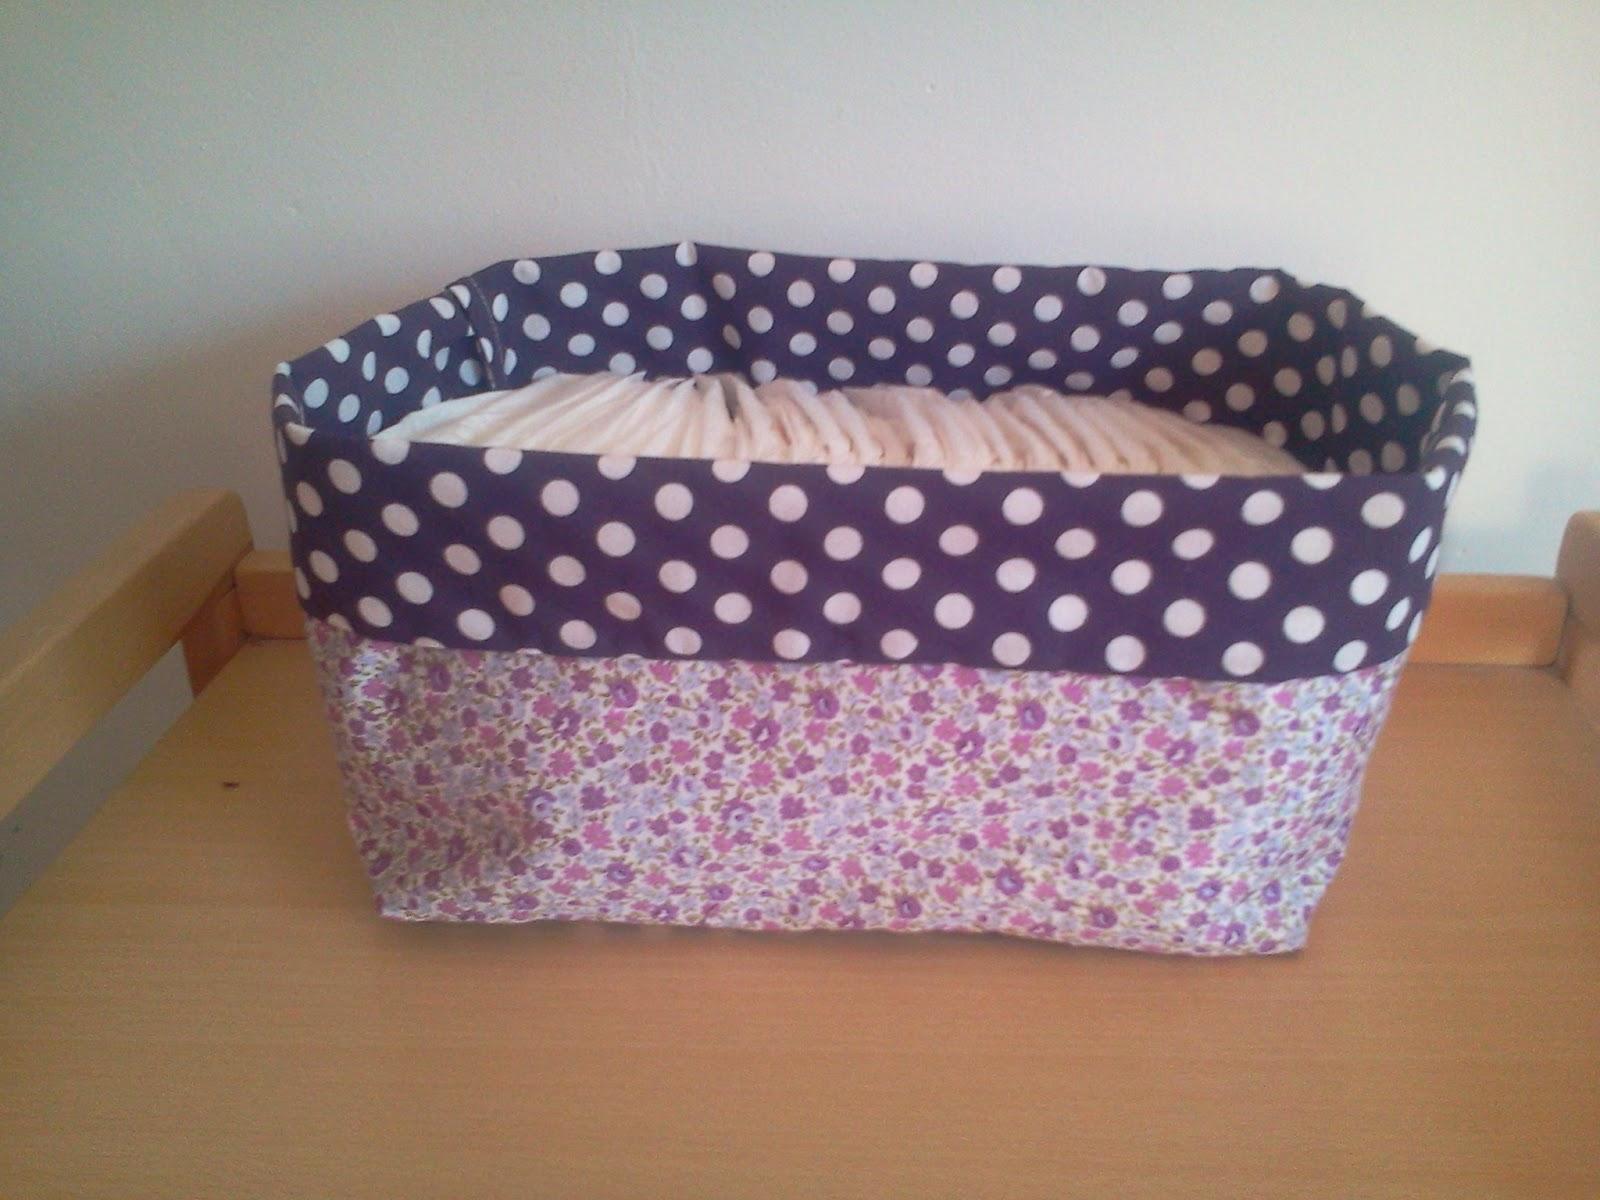 lili joue maman bricole tuto la paniere a couche ou a bazar en tissus. Black Bedroom Furniture Sets. Home Design Ideas